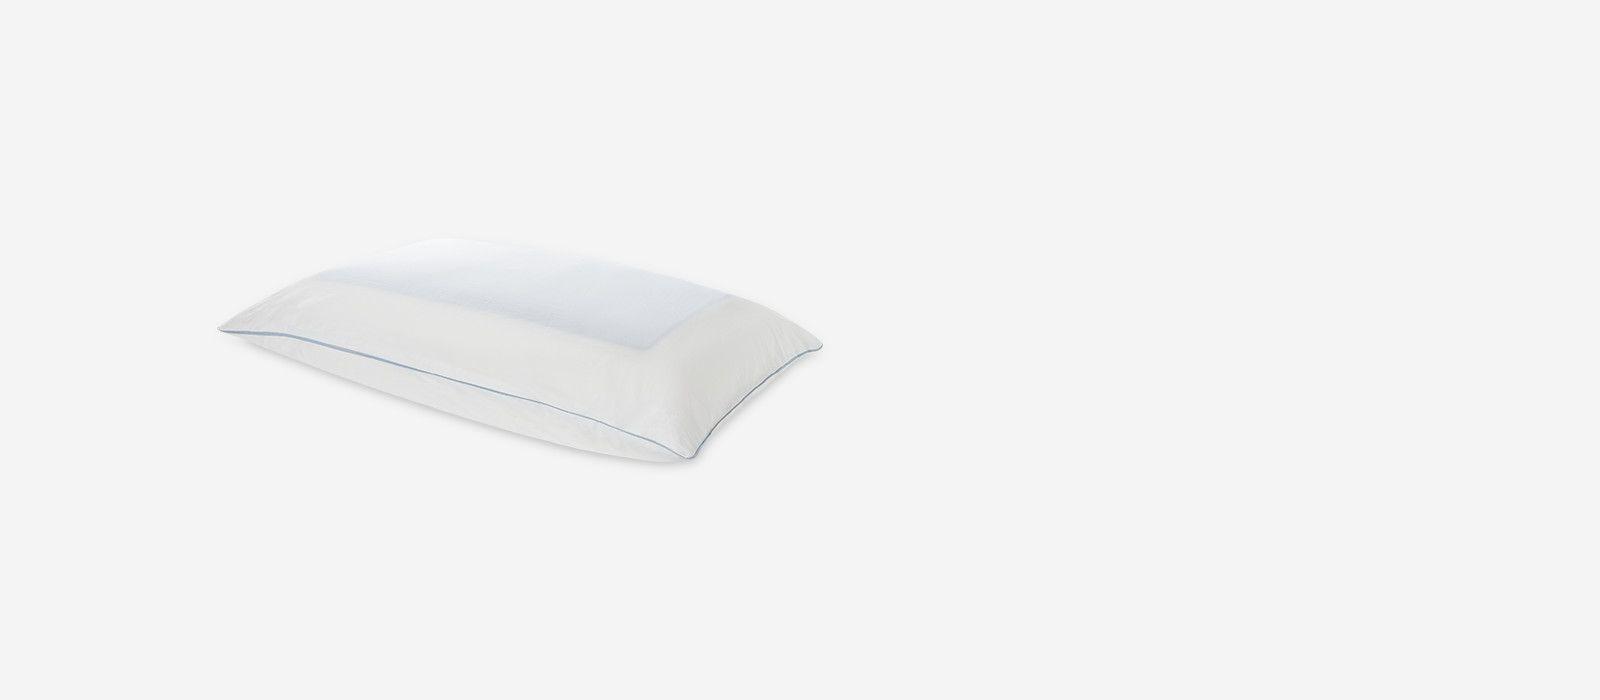 Tempur Cloud Breeze Dual Cooling Pillow Best Pillow Tempurpedic Pillow Tempurpedic